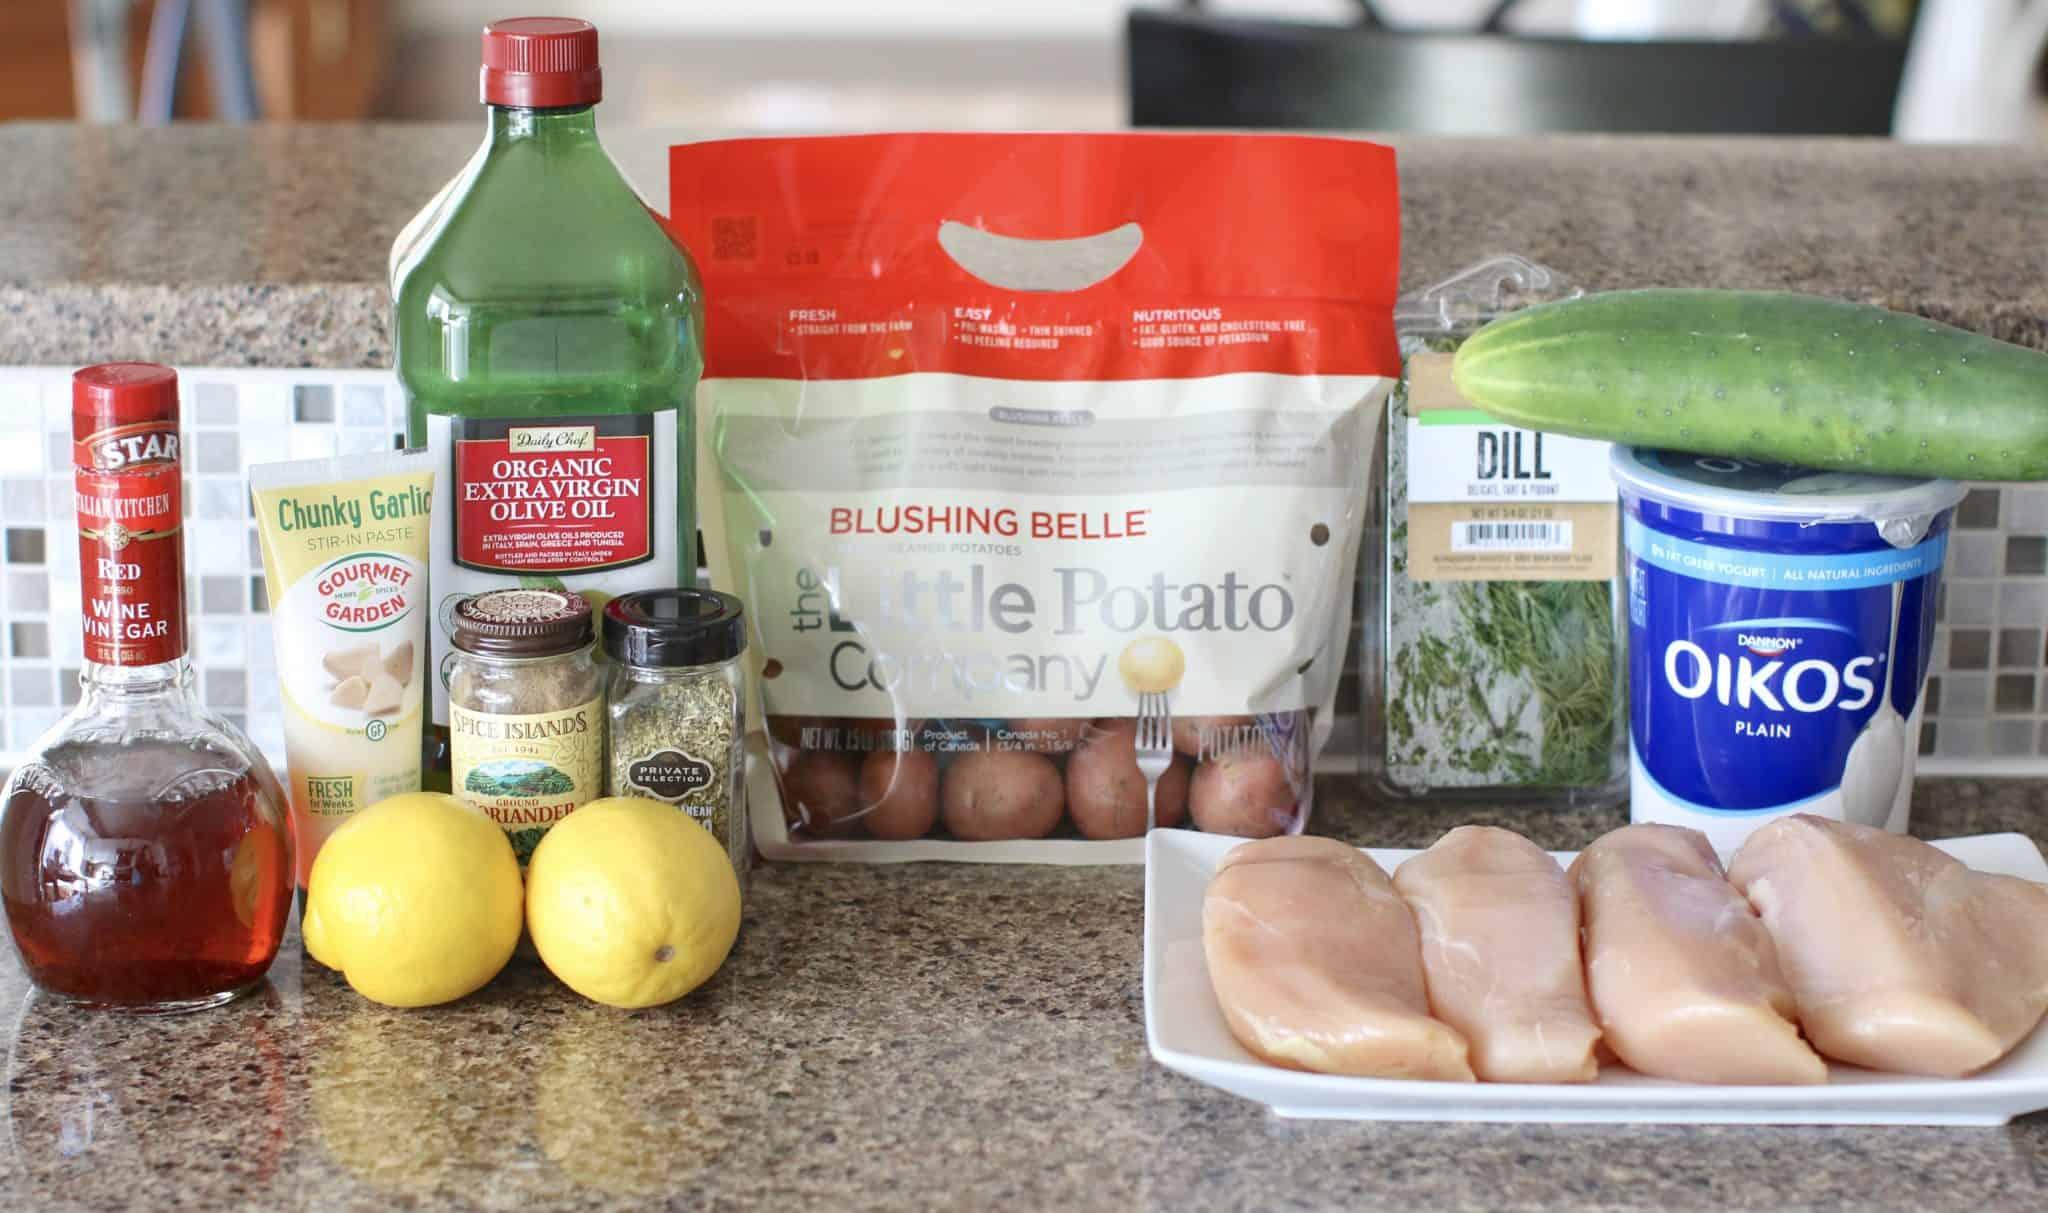 ingredients needed: baby potatoes, chicken breasts, olive oil, lemon juice, red wine vinegar, garlic, oregano, cilantro